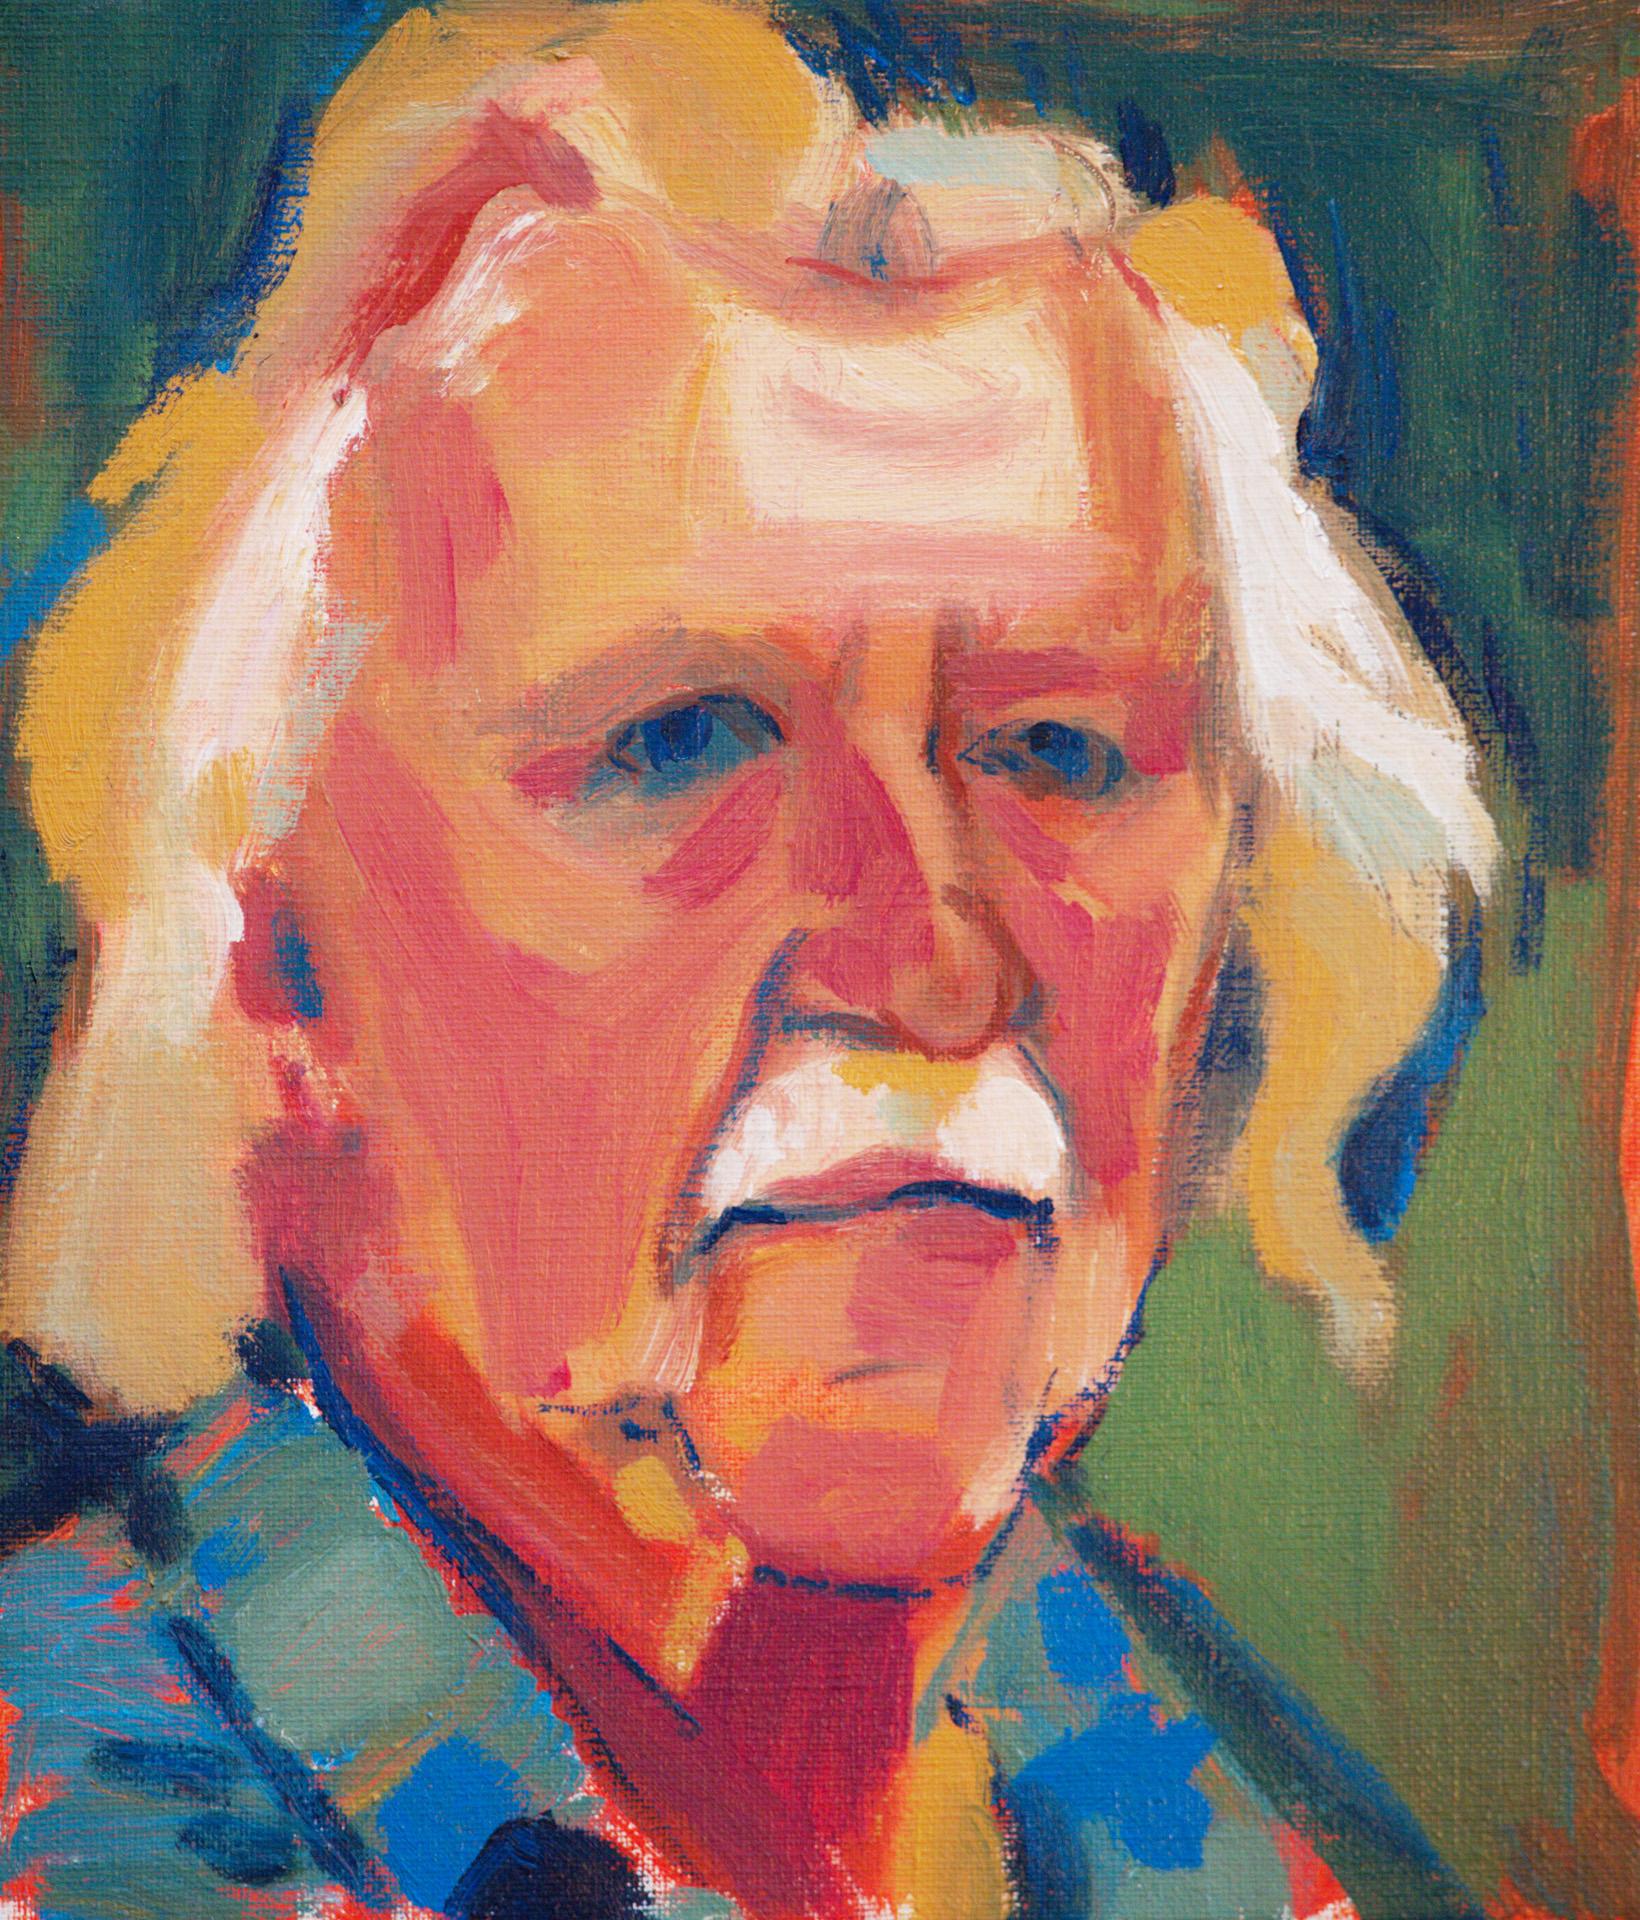 1995_portrait_30x35cm_Anton_Blatnik.jpg